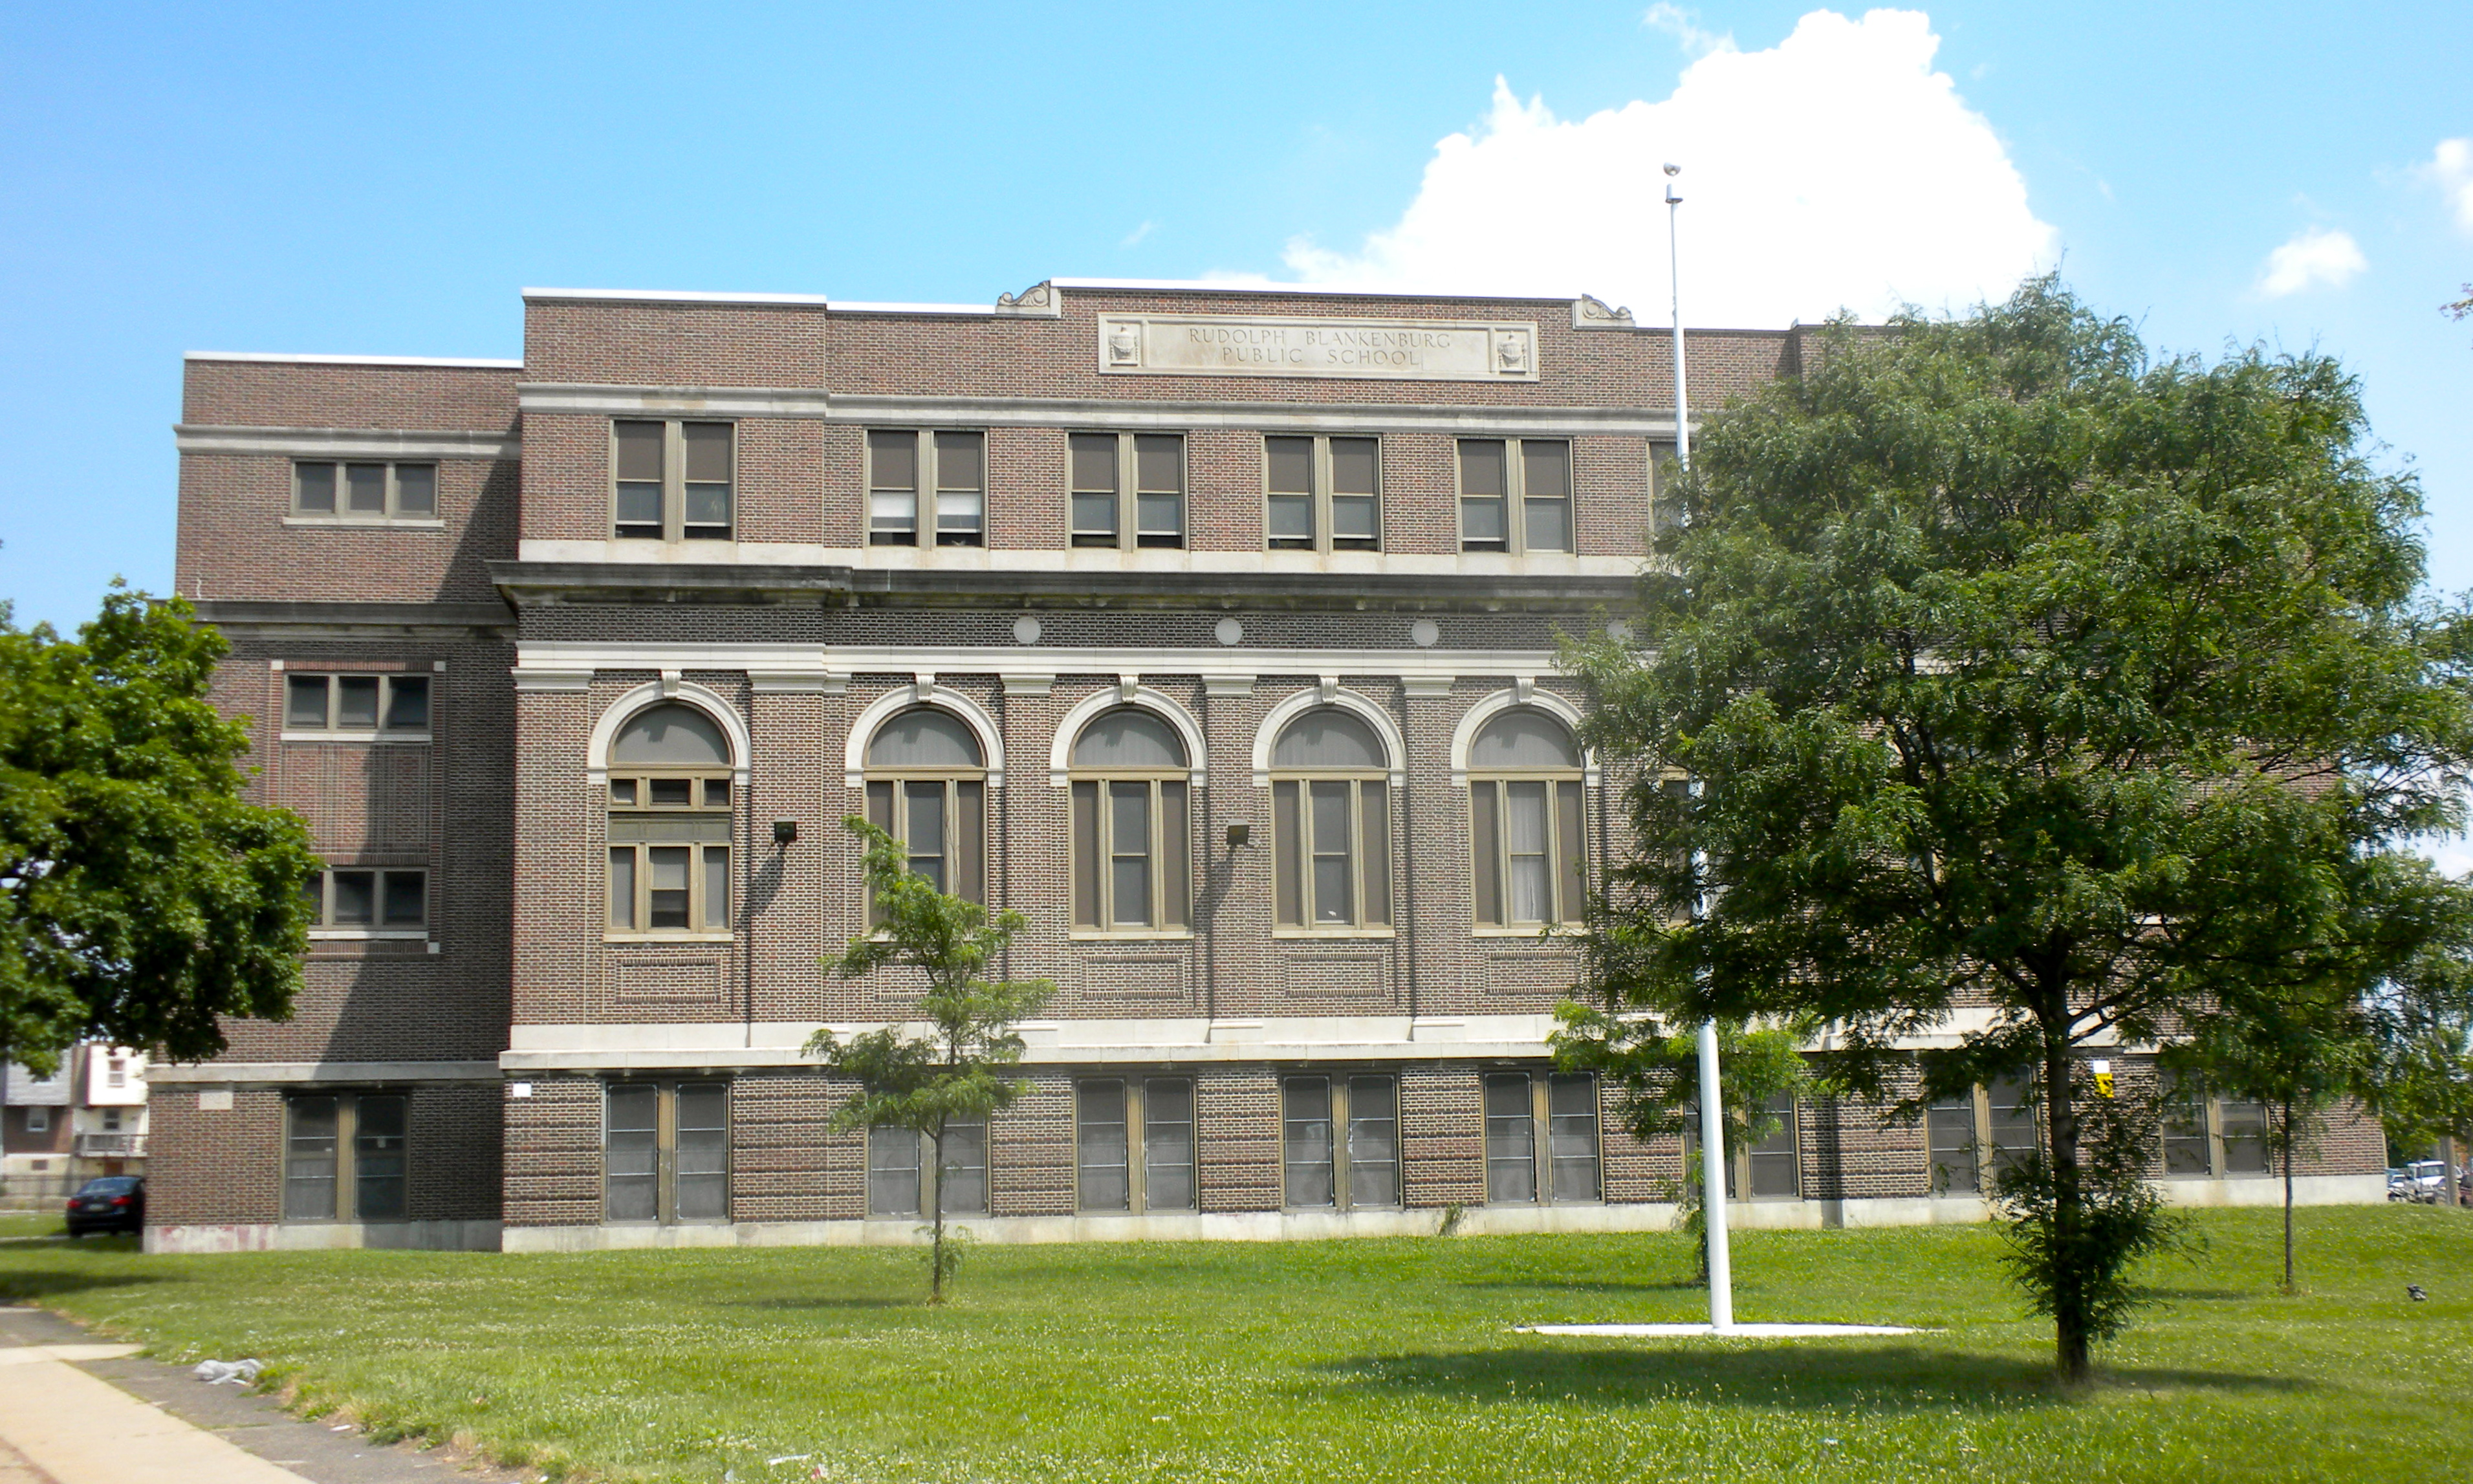 Rudolph Blankenburg School - Wikipedia